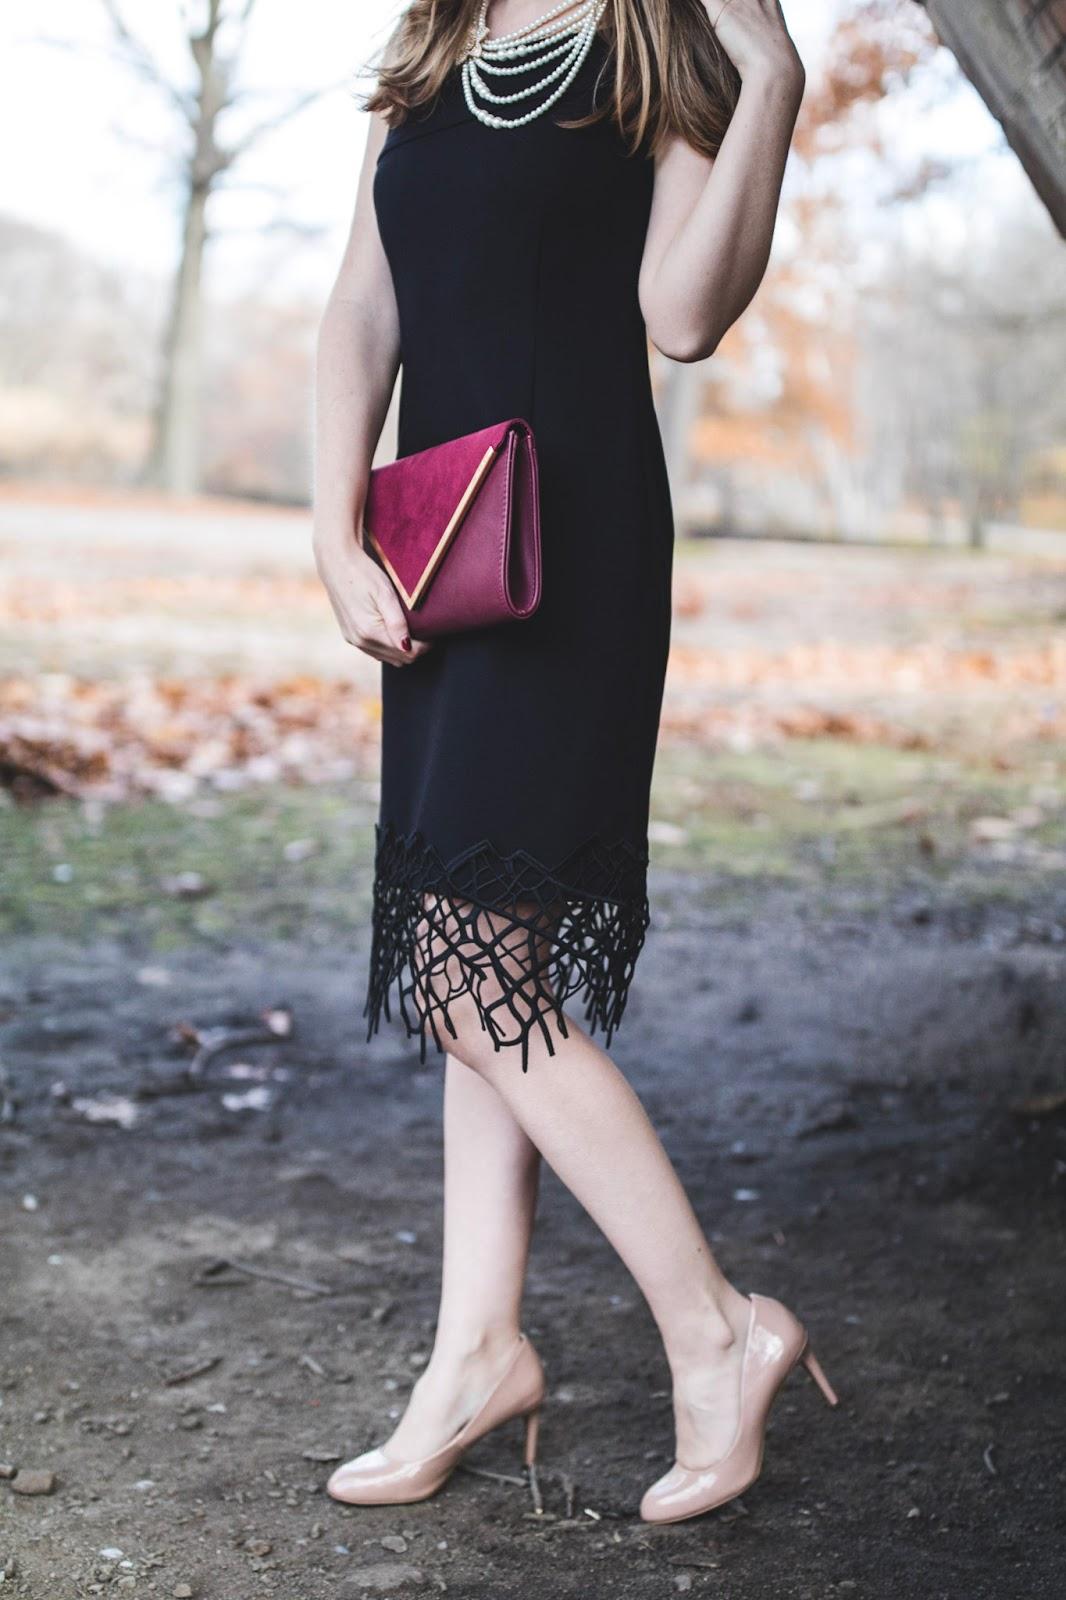 minan-wong-audrey-hepburn-dress